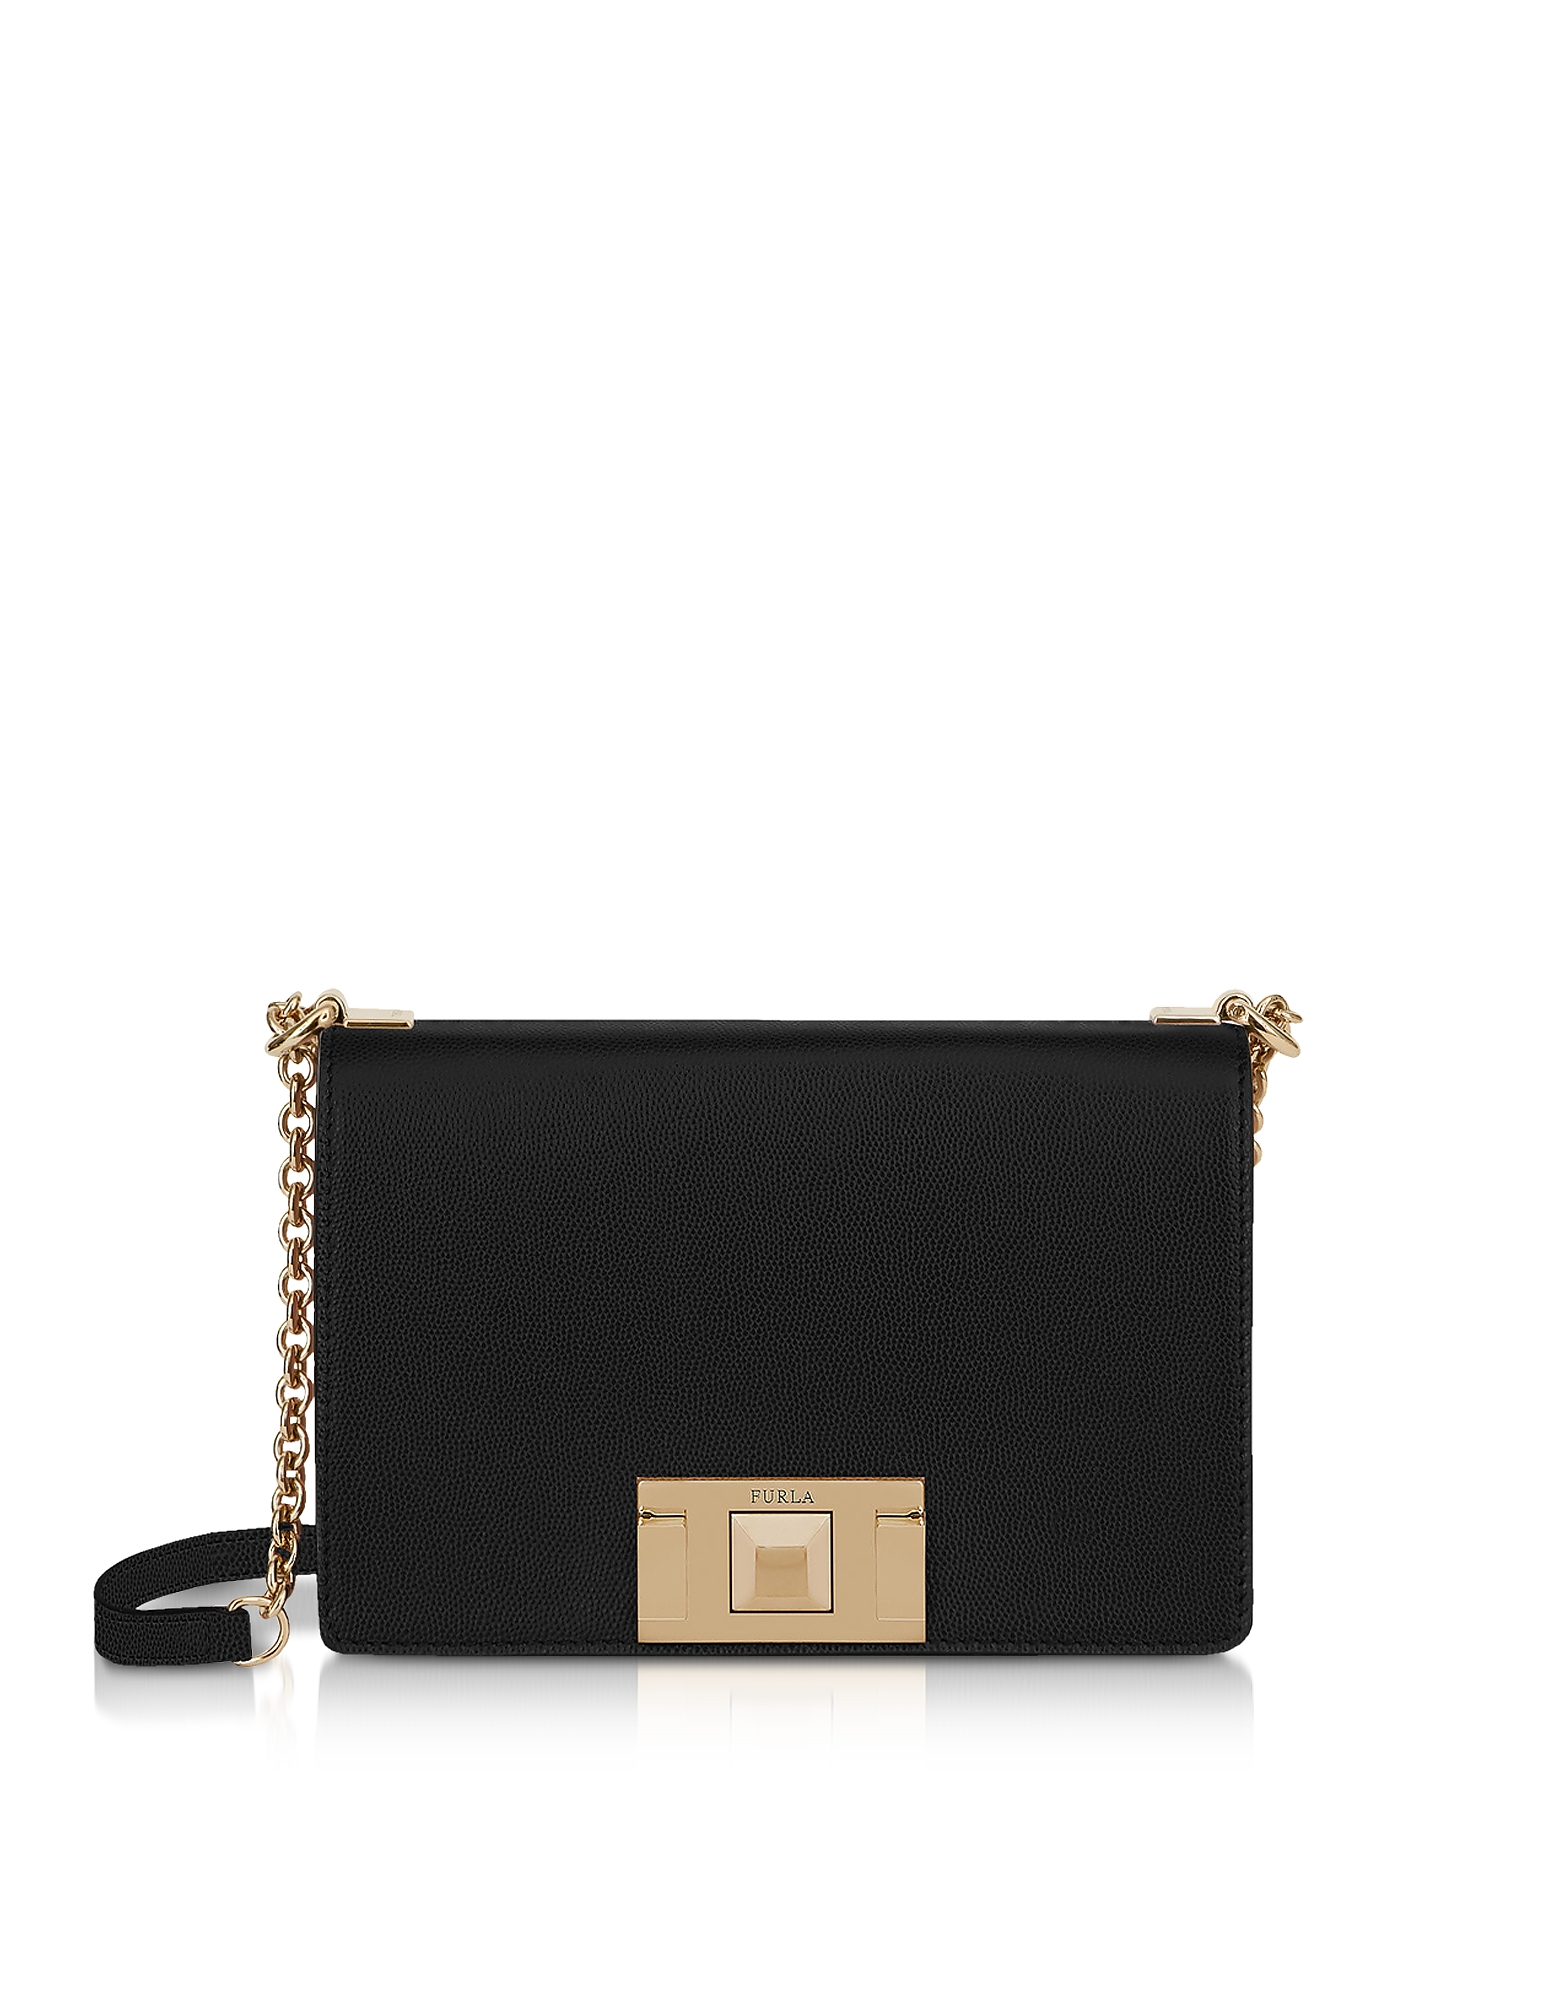 Furla Designer Handbags, Black Leather Mimì Mini Crossbody Bag